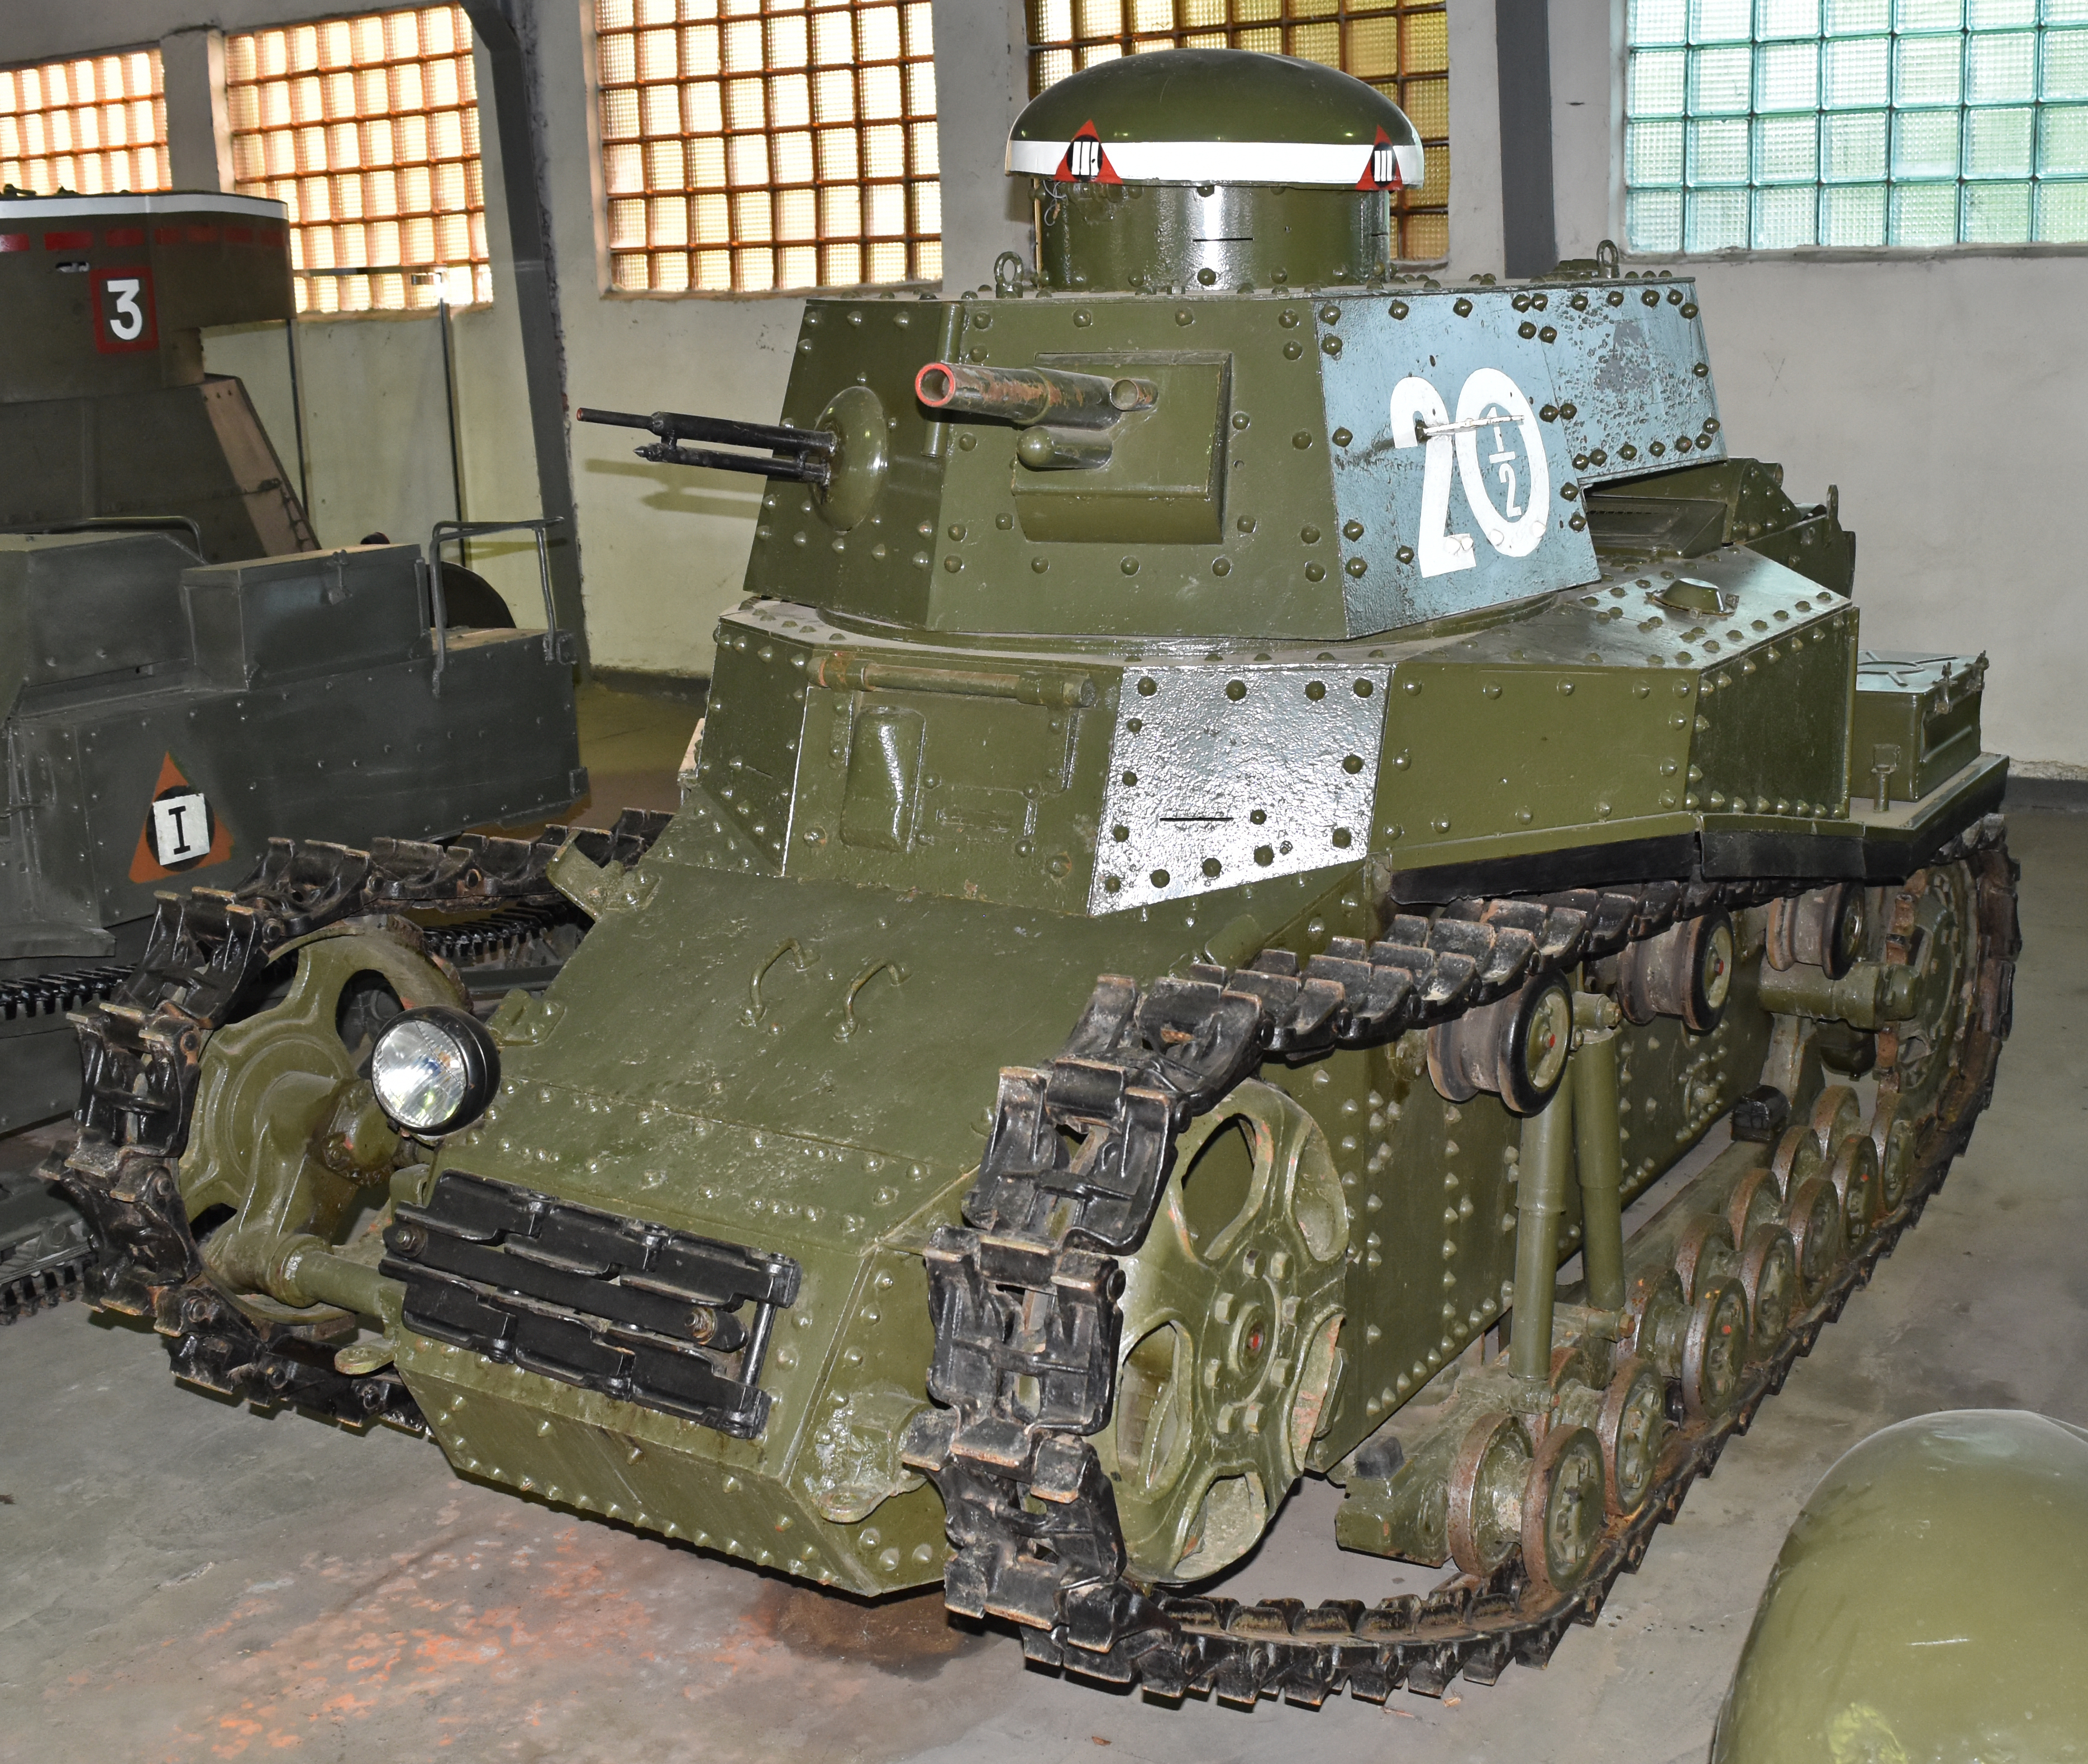 T-18_(MS-1)_Light_Tank_'20_1-2'_(3752153